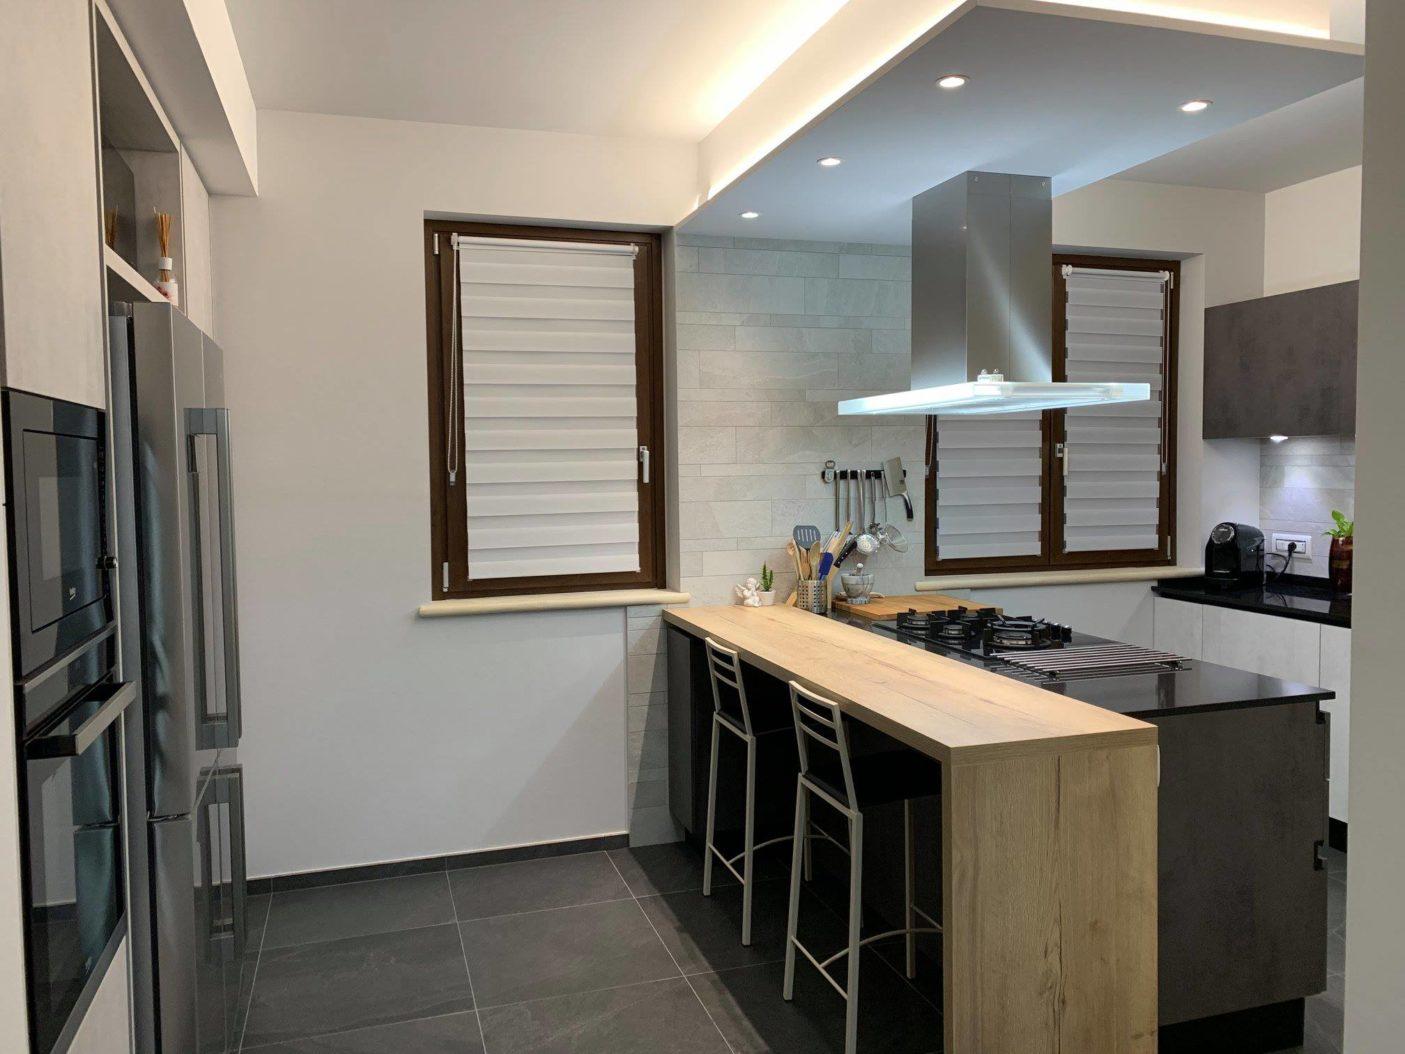 Cucina-Creo-Kitchens-Tablet-Personalizzata4-1.jpg